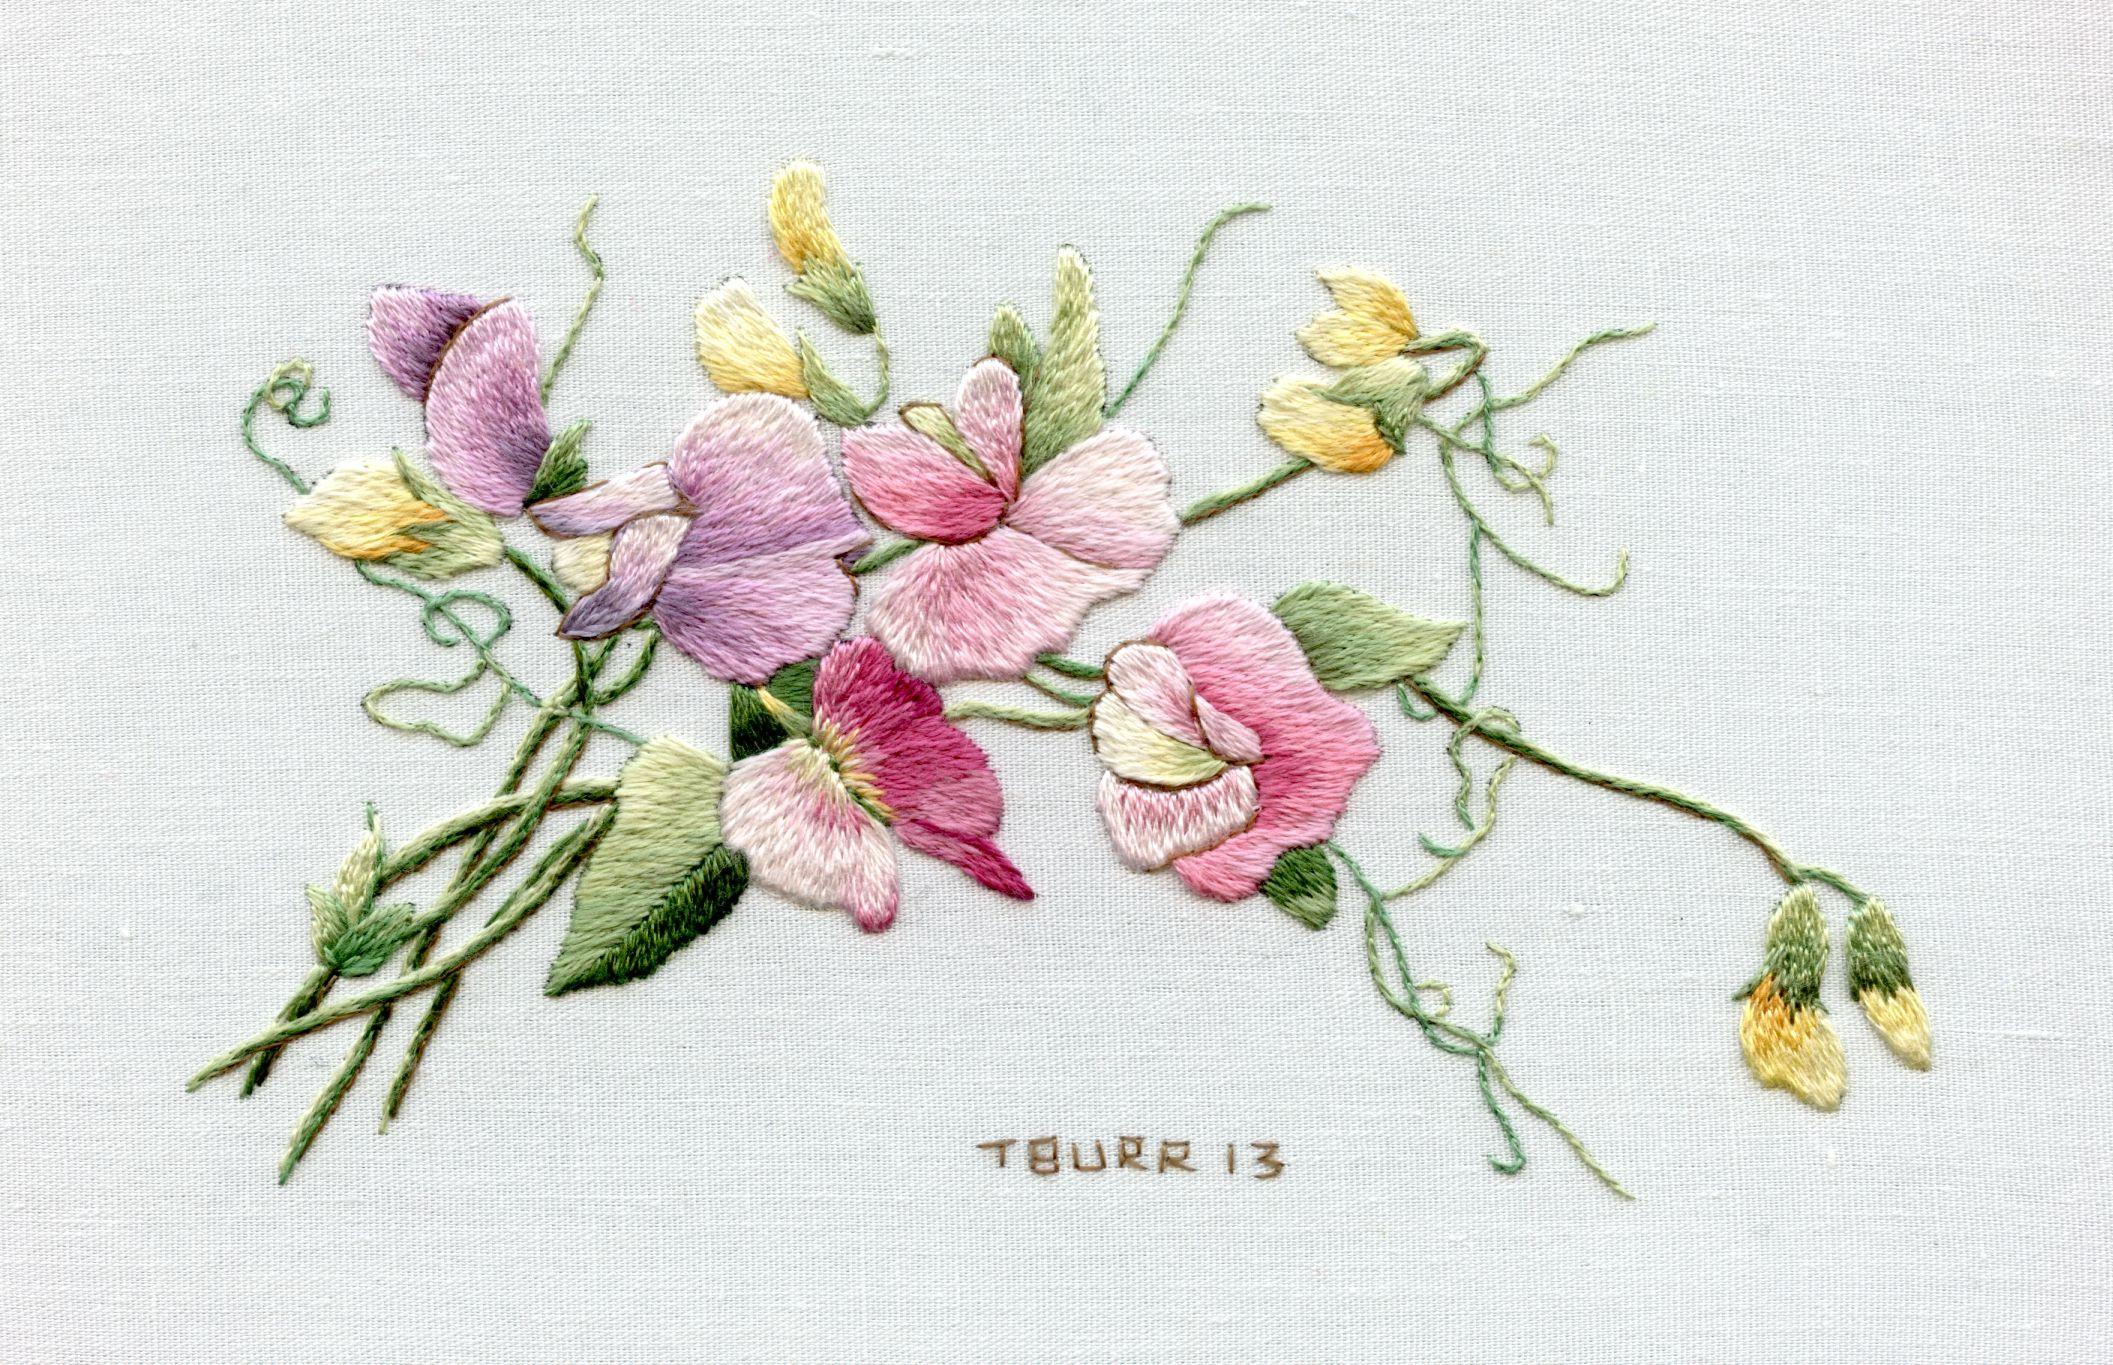 Sweet Peas Trish Burr Embroidery